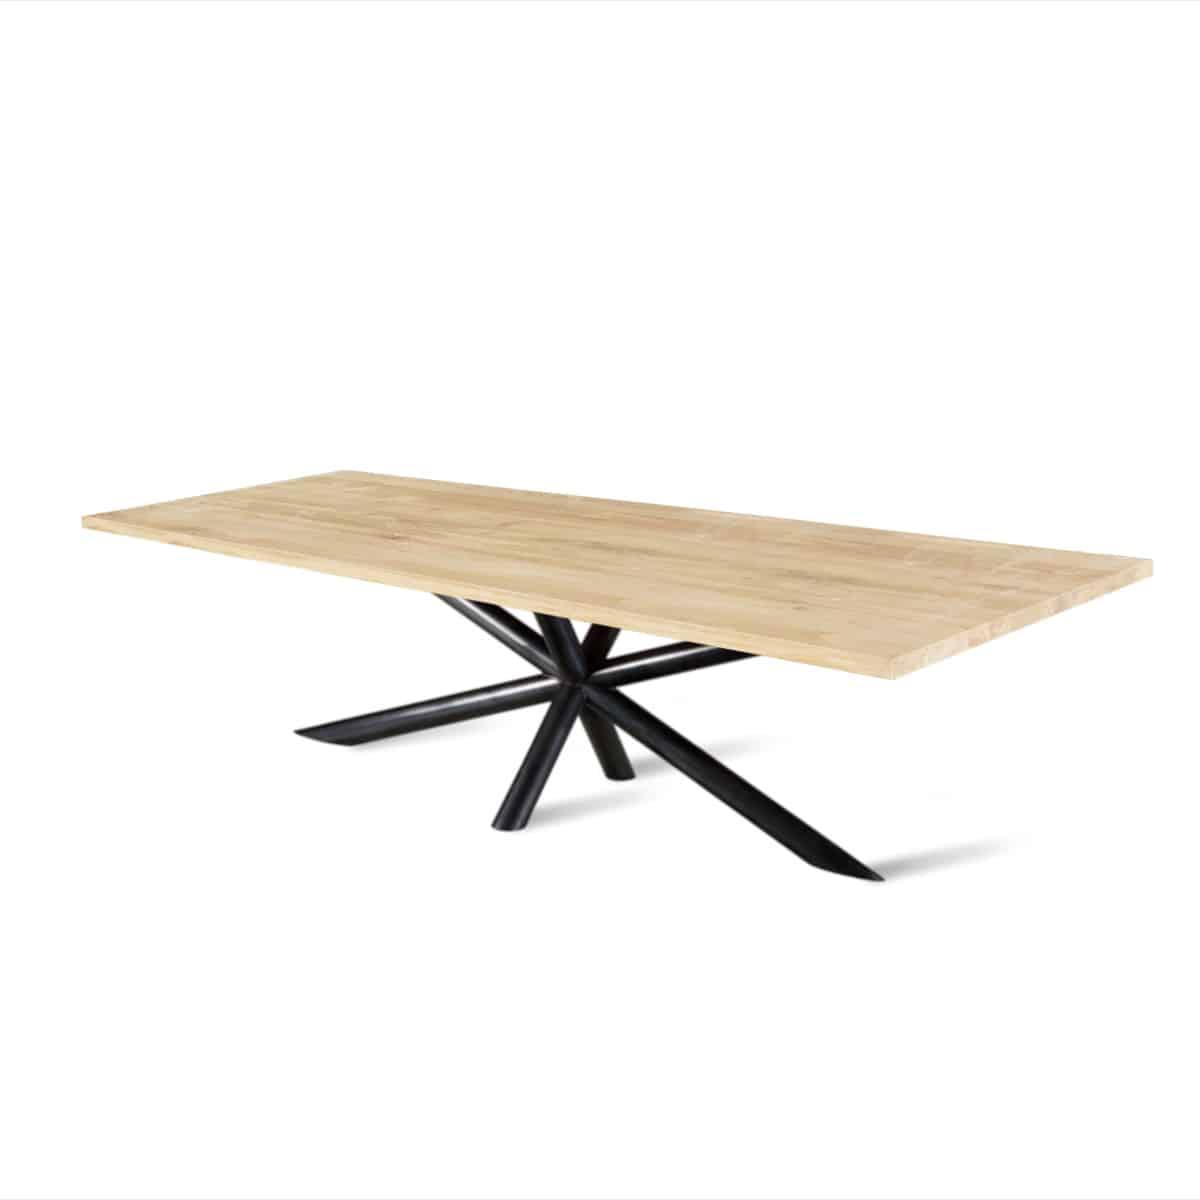 Ovaal ovale massief eiken eikenhouten boomstam eetkamer tafel eettafel keuken meubelmaker Friesland